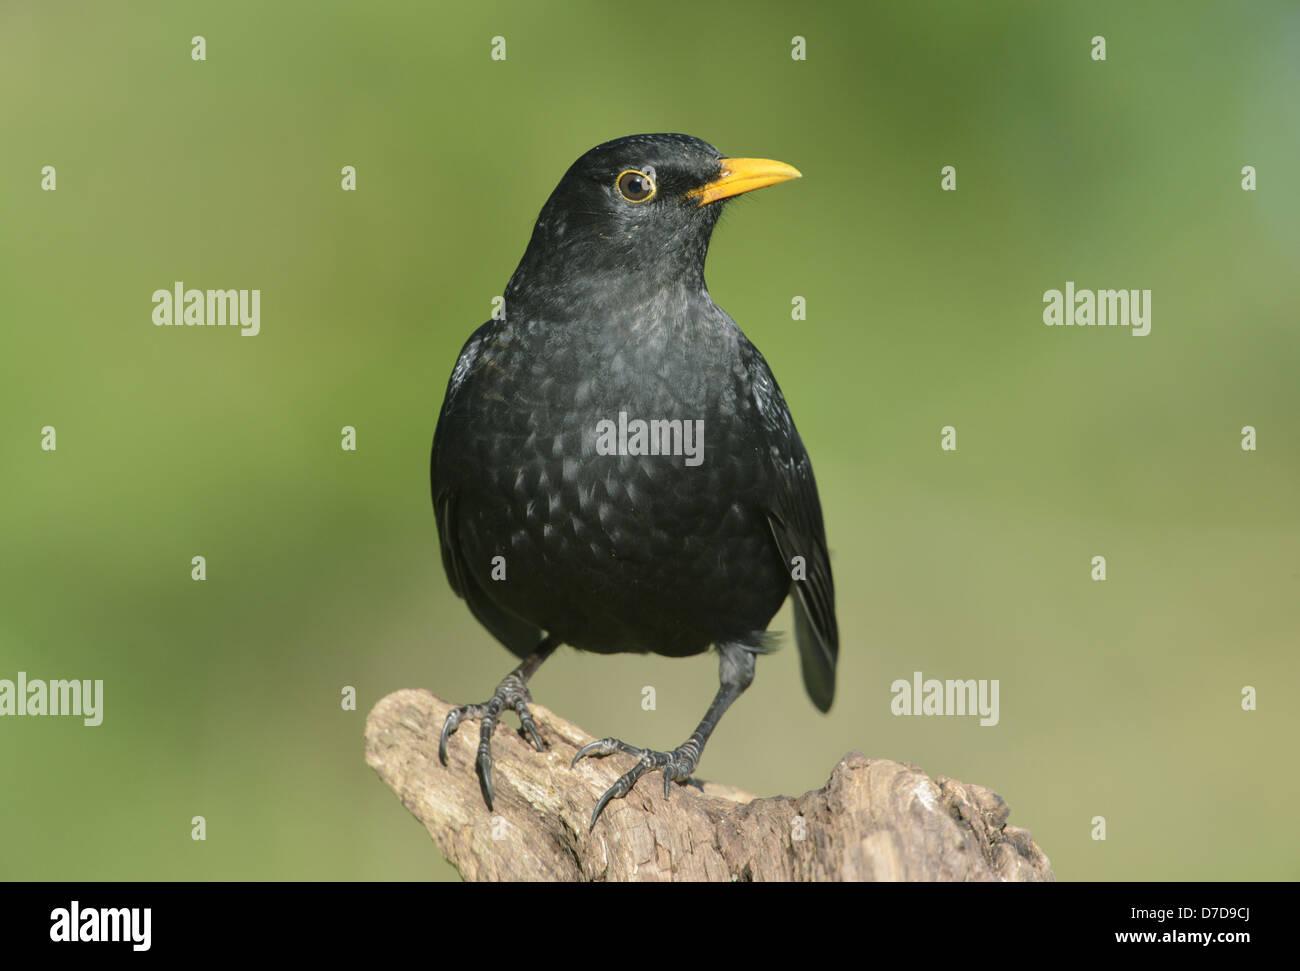 Blackbird Turdus merula - Stock Image